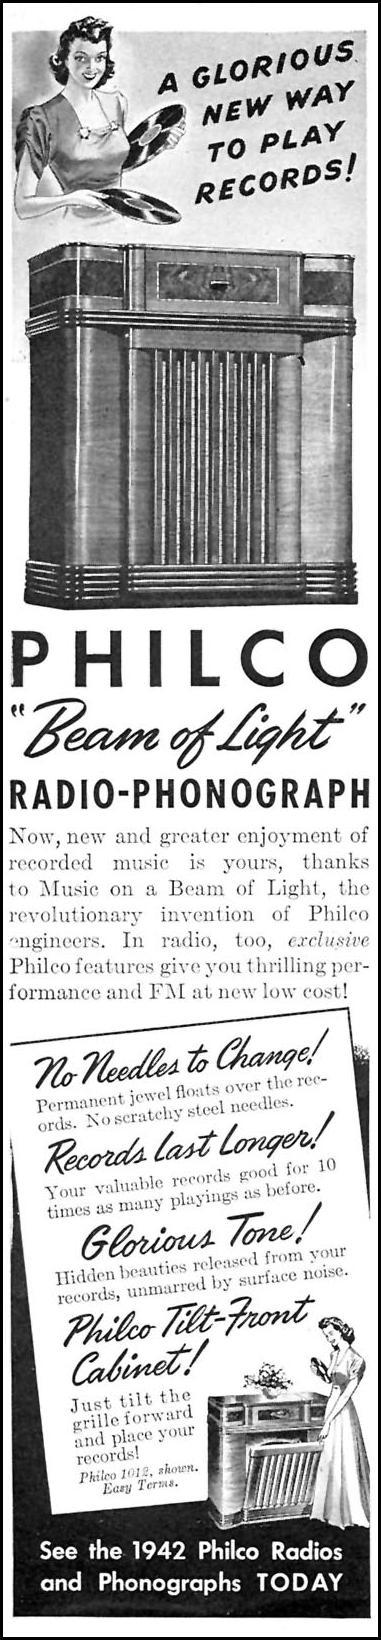 PHILCO PHOTO-ELECTRIC RADIO-PHONOGRAPHS TIME 01/12/1942 p. 2